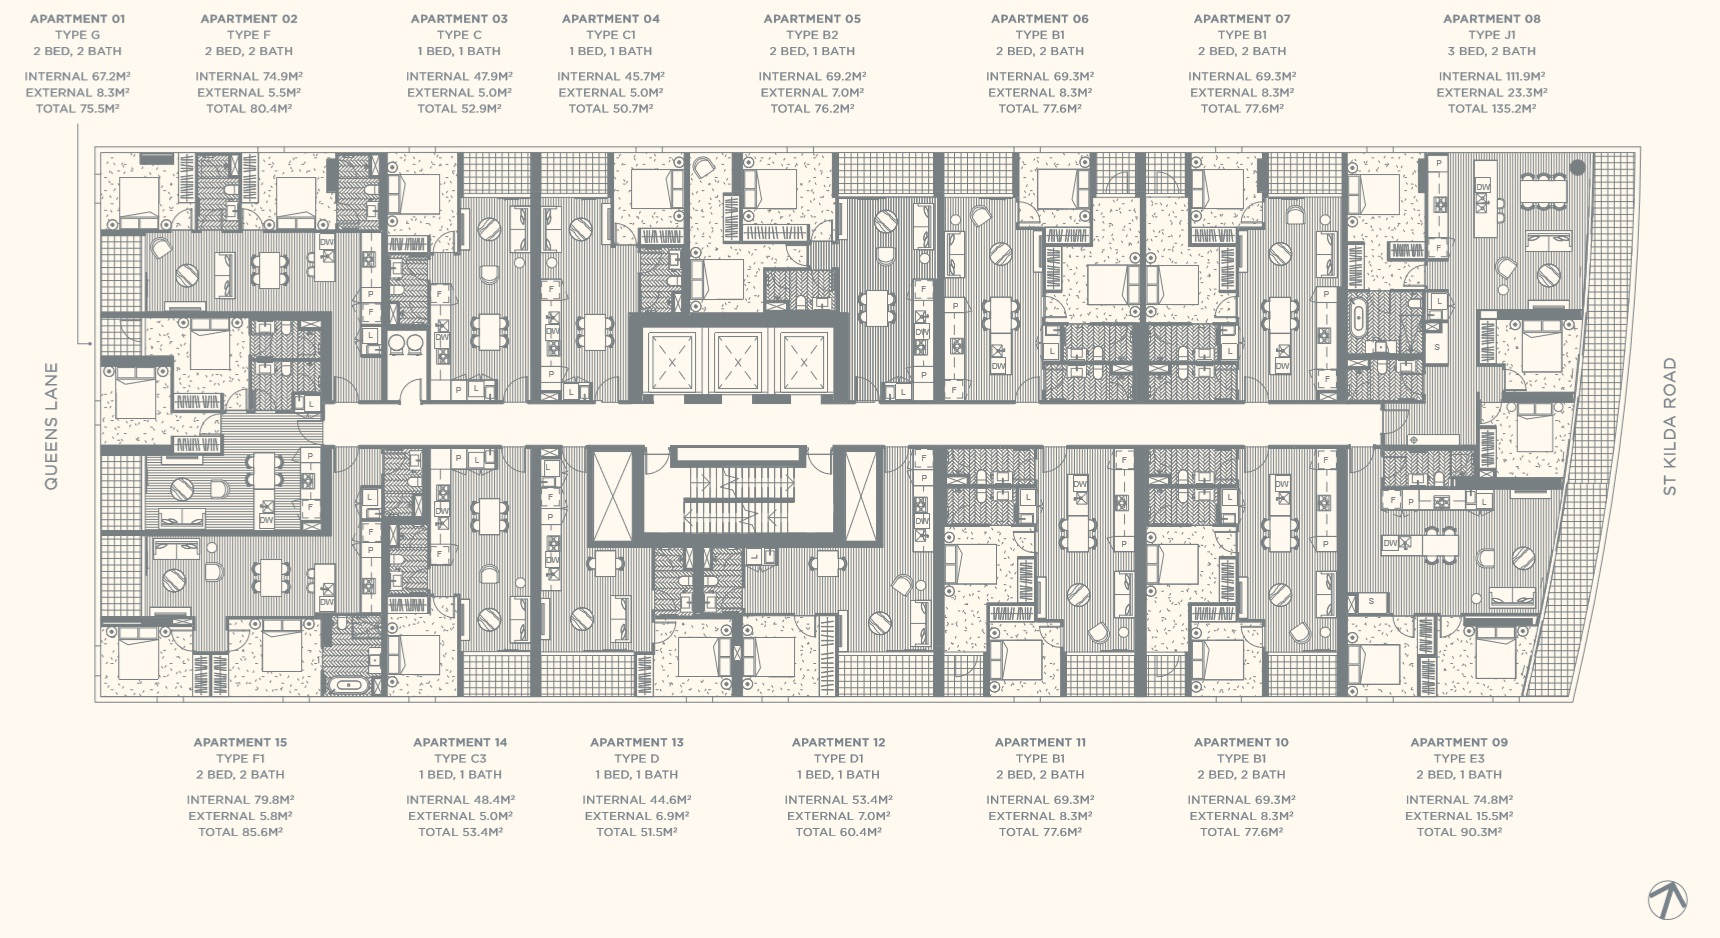 Floor Plate Level 03